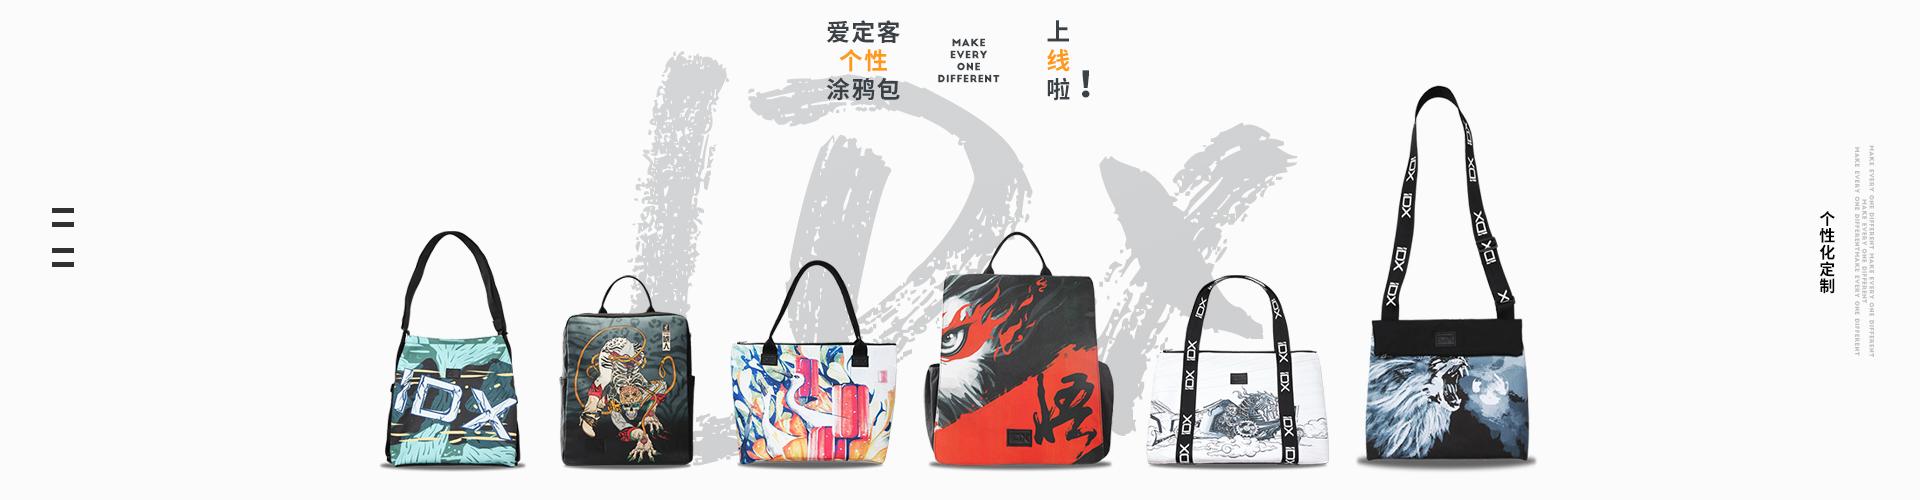 idx.com.cn-爱定客